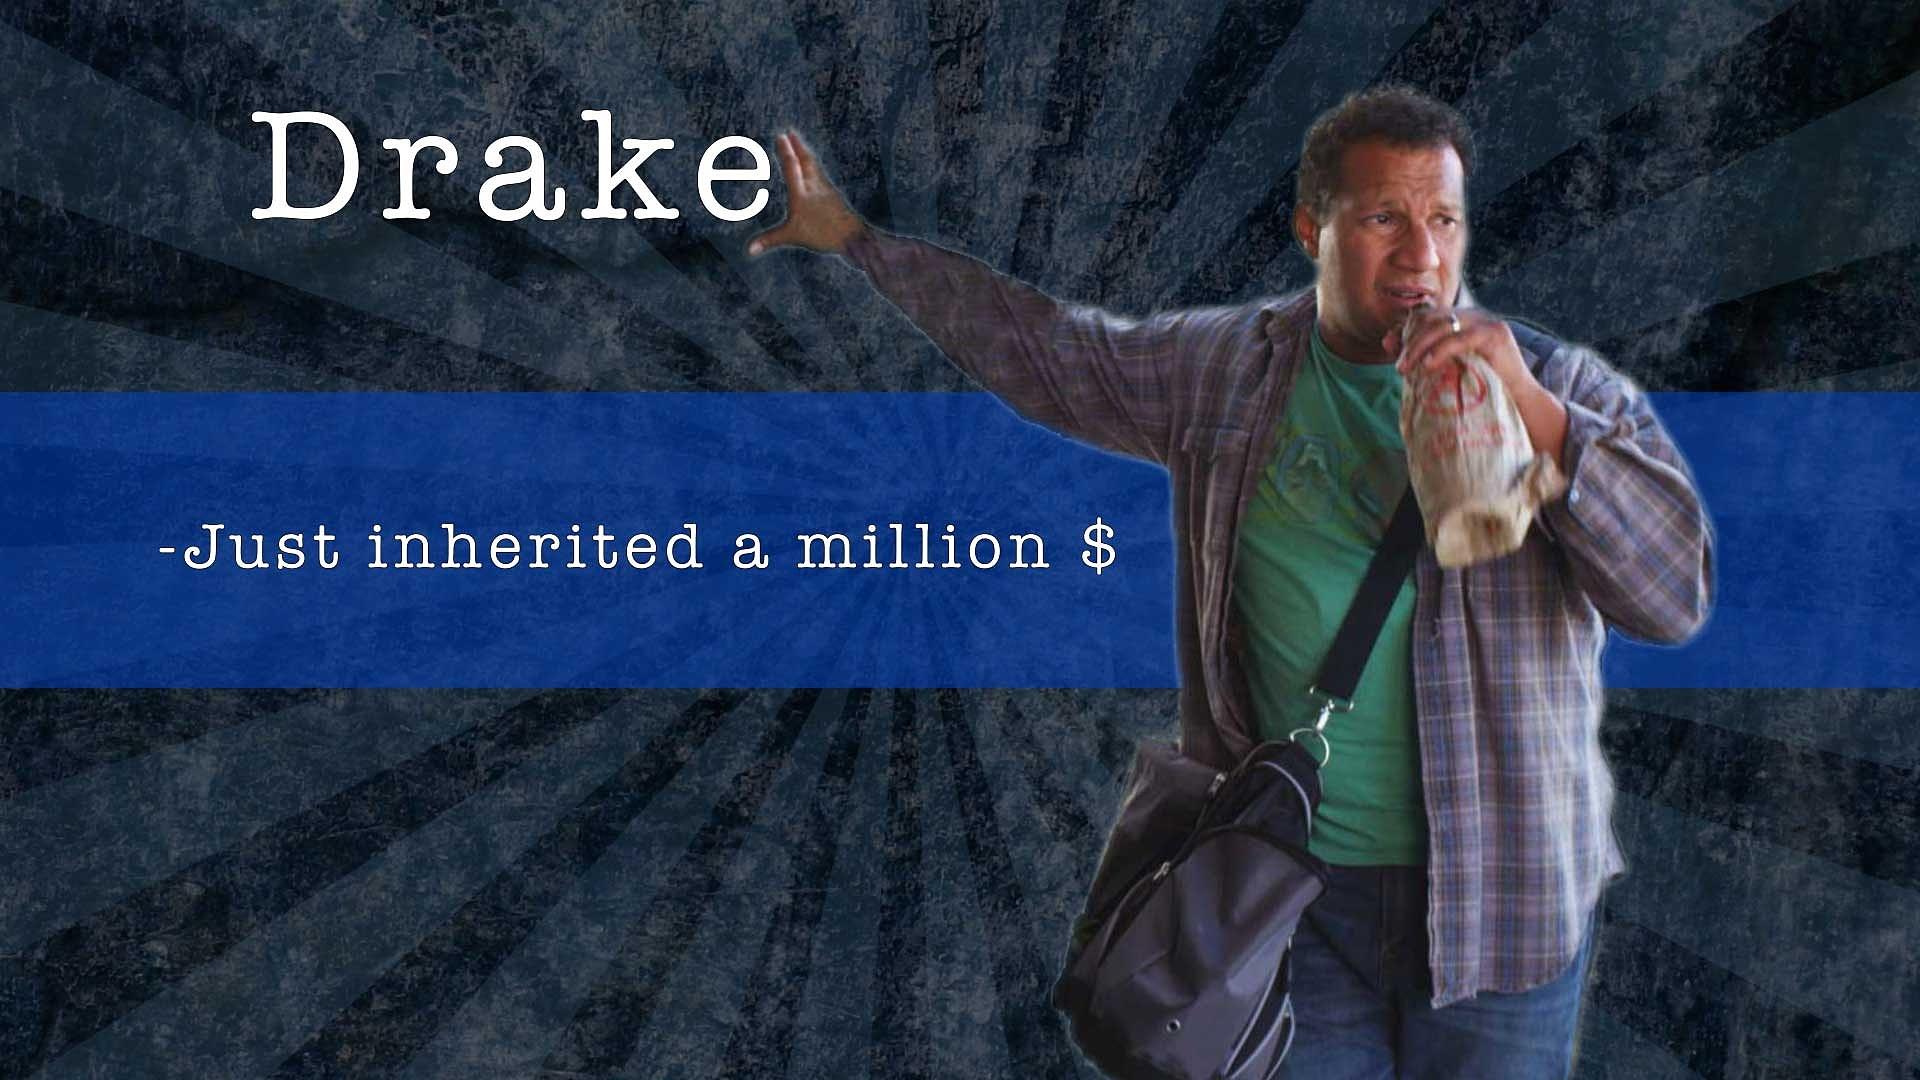 Drake Just inherited 1 million dollars